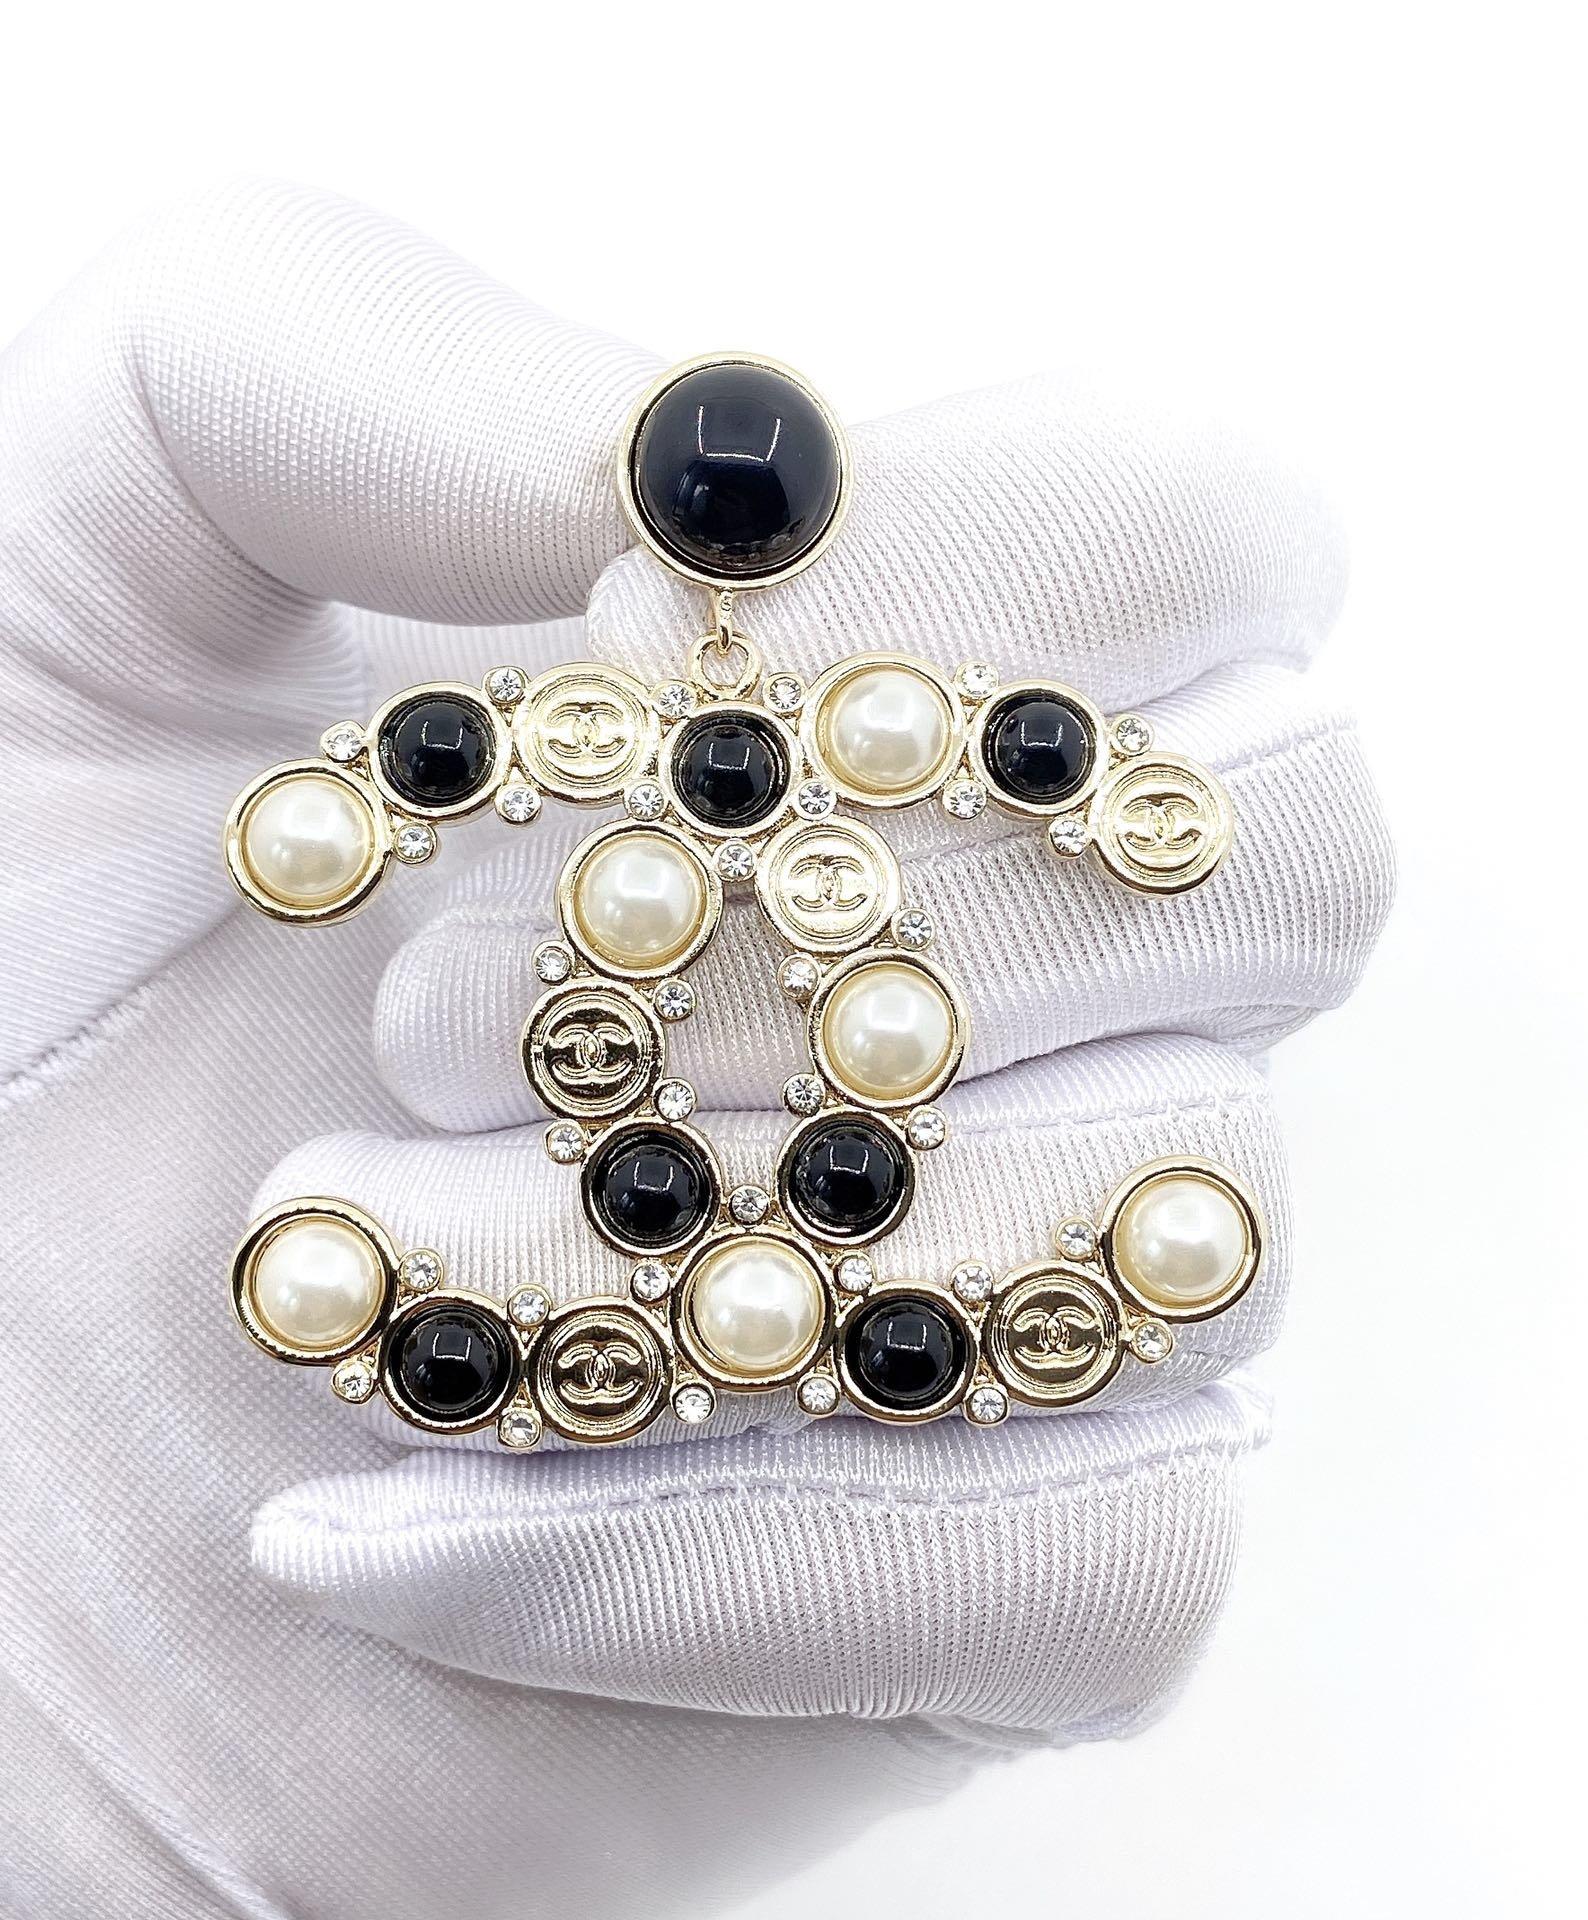 Chanel新款黑白珍珠耳环一致黄铜